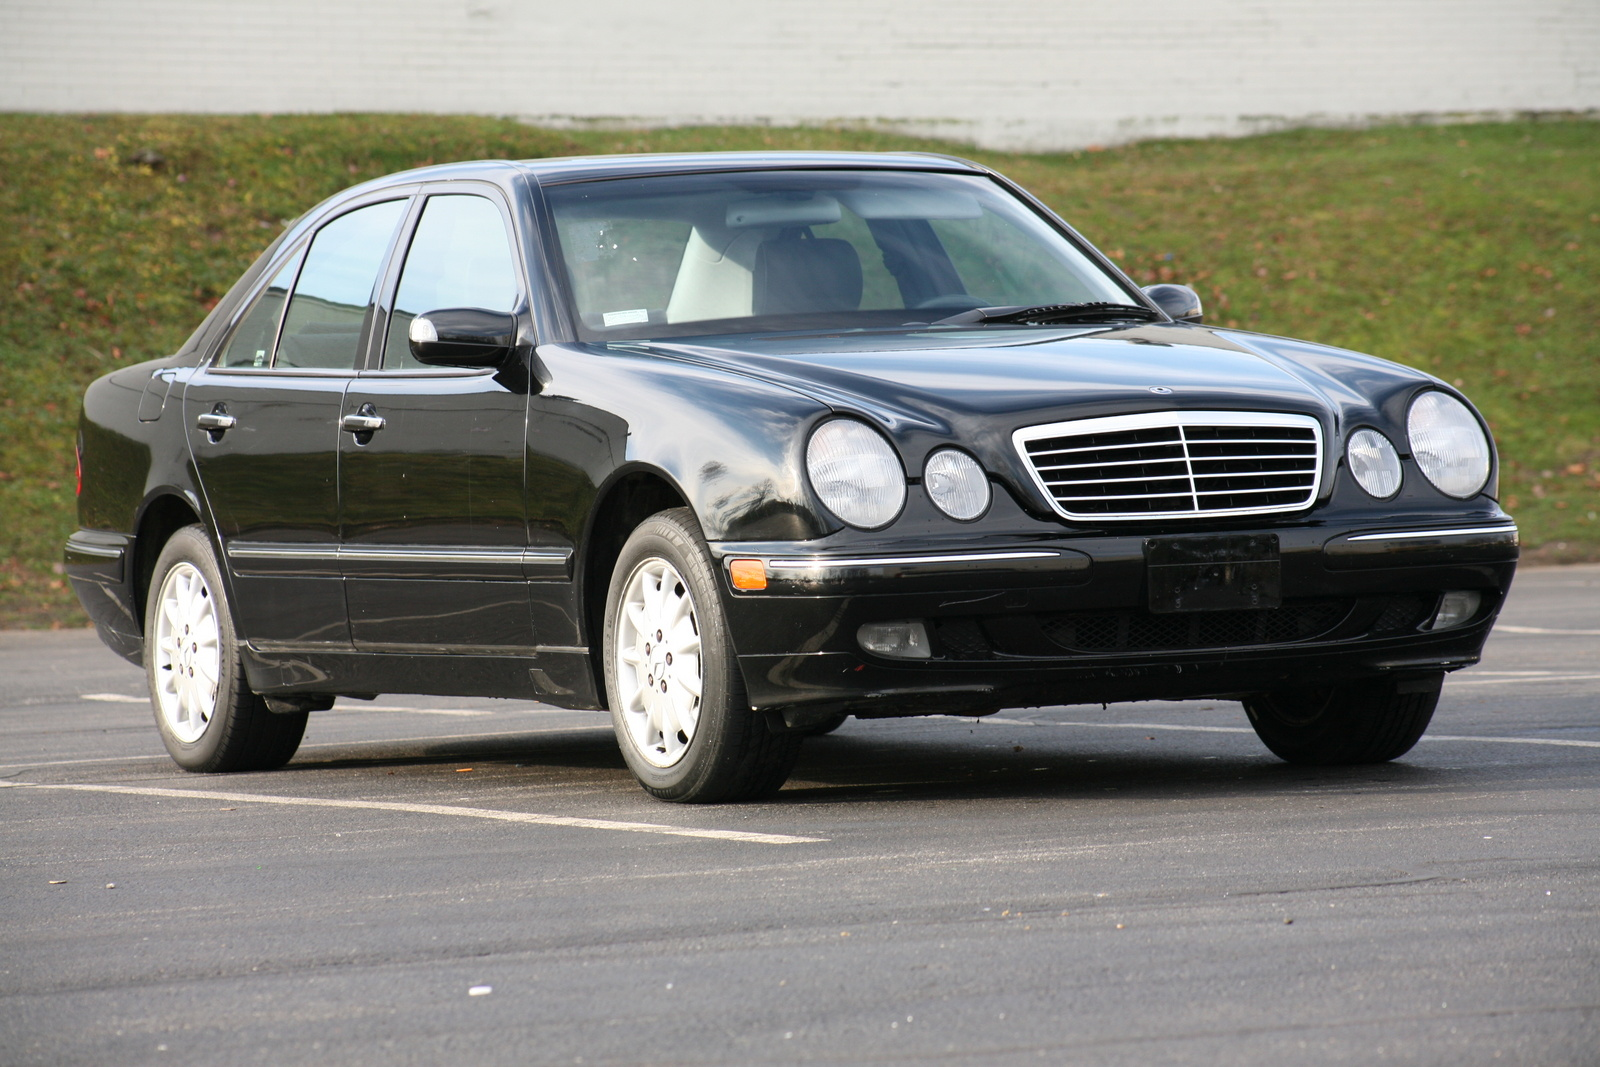 2002 mercedes benz e class pictures cargurus for Mercedes benz suv 2002